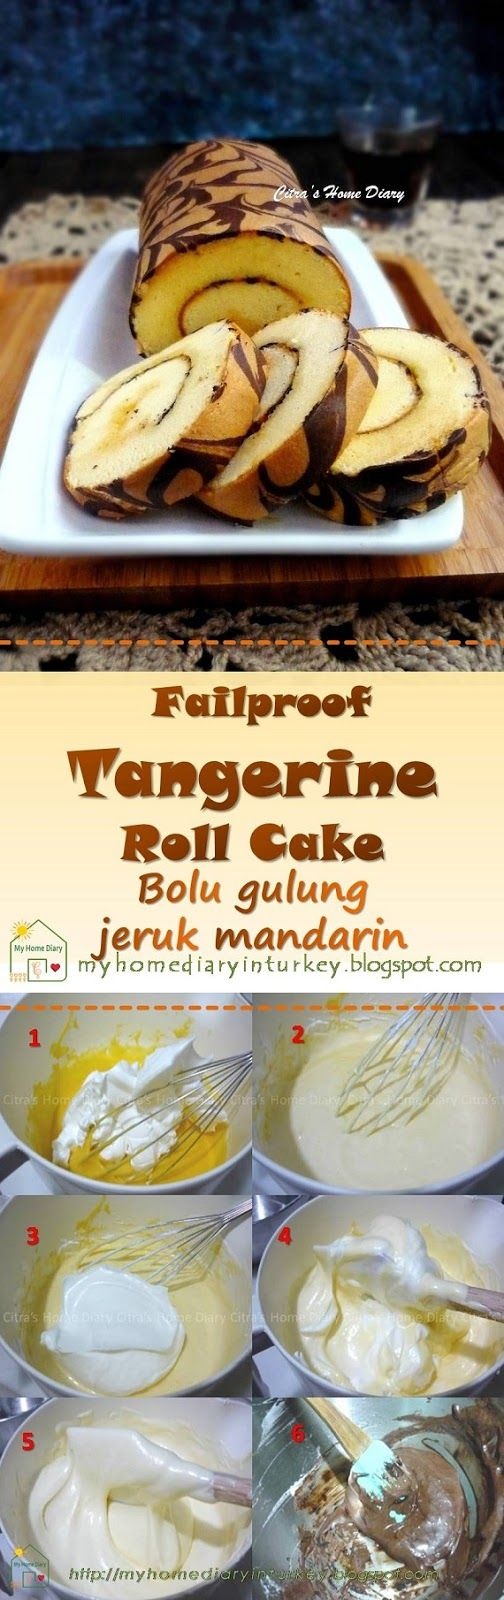 Tangerine orange Roll Cake, easy and failproof / Bolu gulunge jeruk mandarin-Çitra's Home Diary. #mandarinorange #tangerineorange #swissrollcake #baking #bolugulung #bolguljeruk #cake #dessert